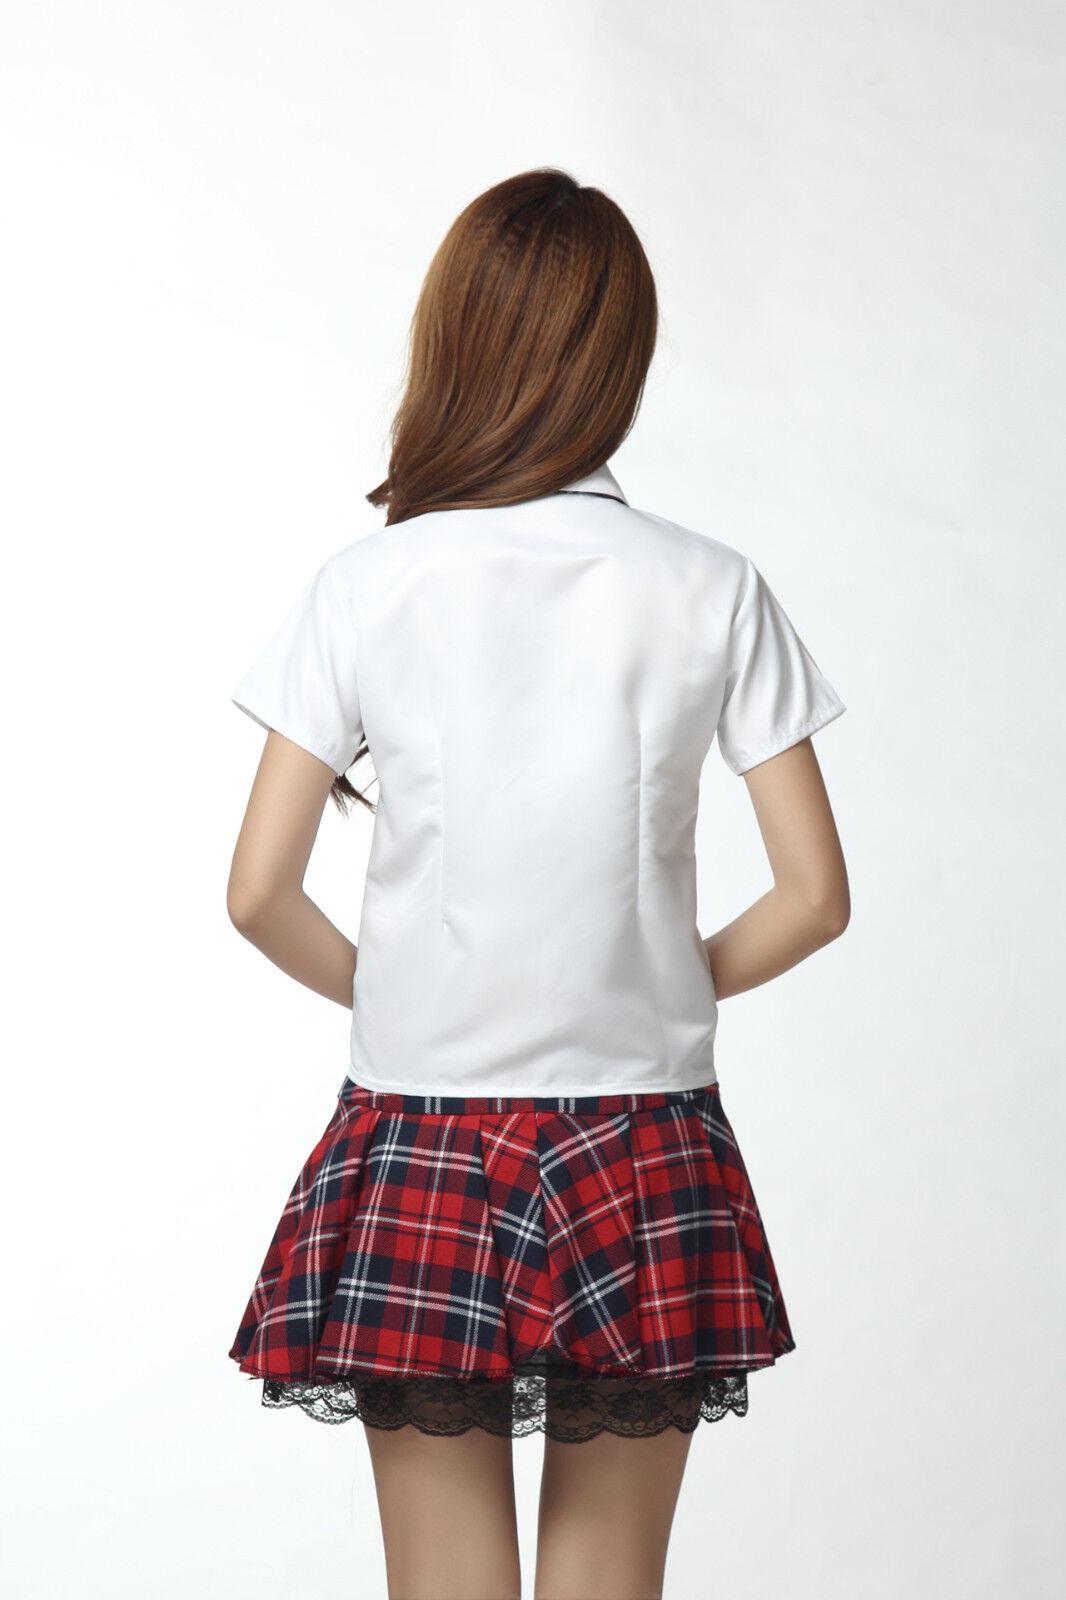 Купить Unbranded - Korean Japanese School Girl Cosplay Costume Student Uniform w Suit Jacket party